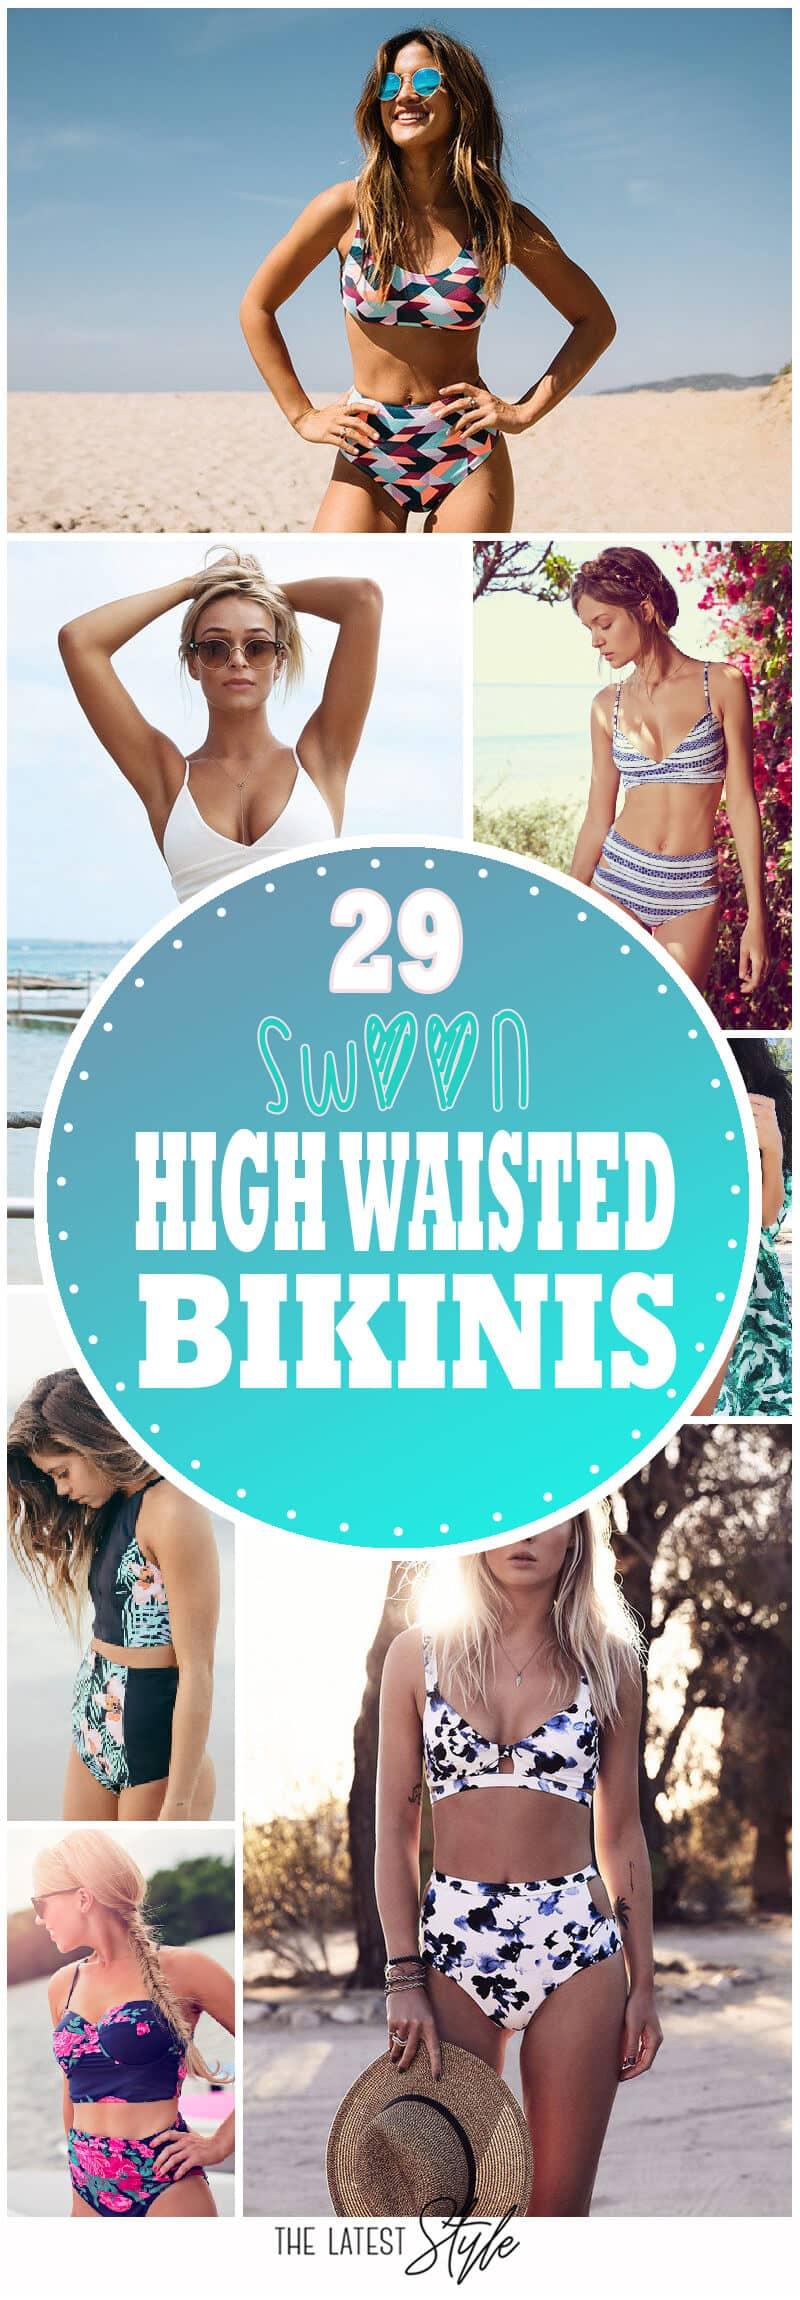 29 Swoon High Waisted Bikini Ideas